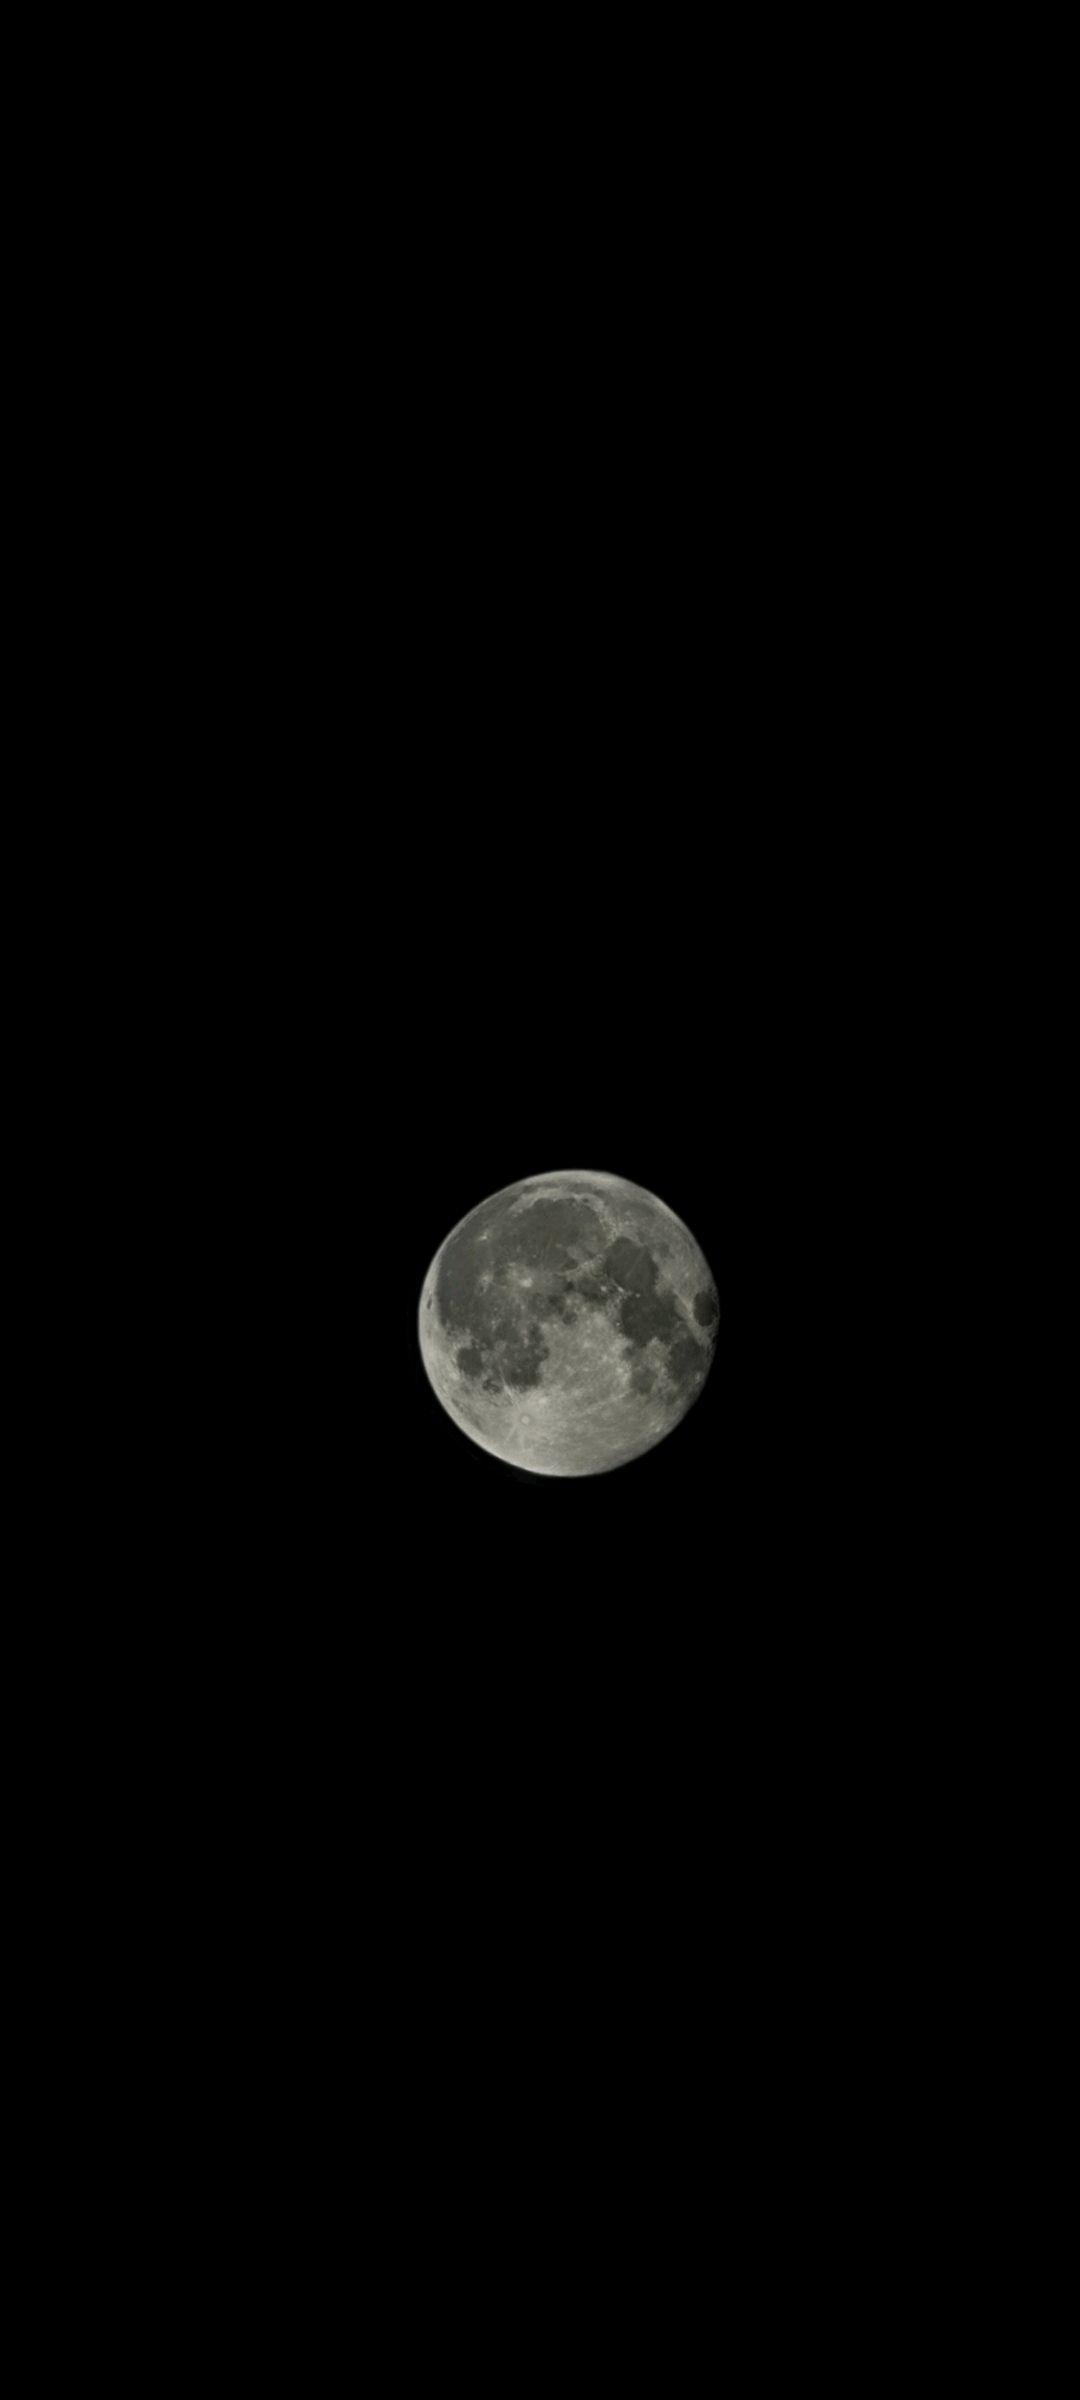 Soaking in the moonlight. Taken by @r_sylvar.onyx